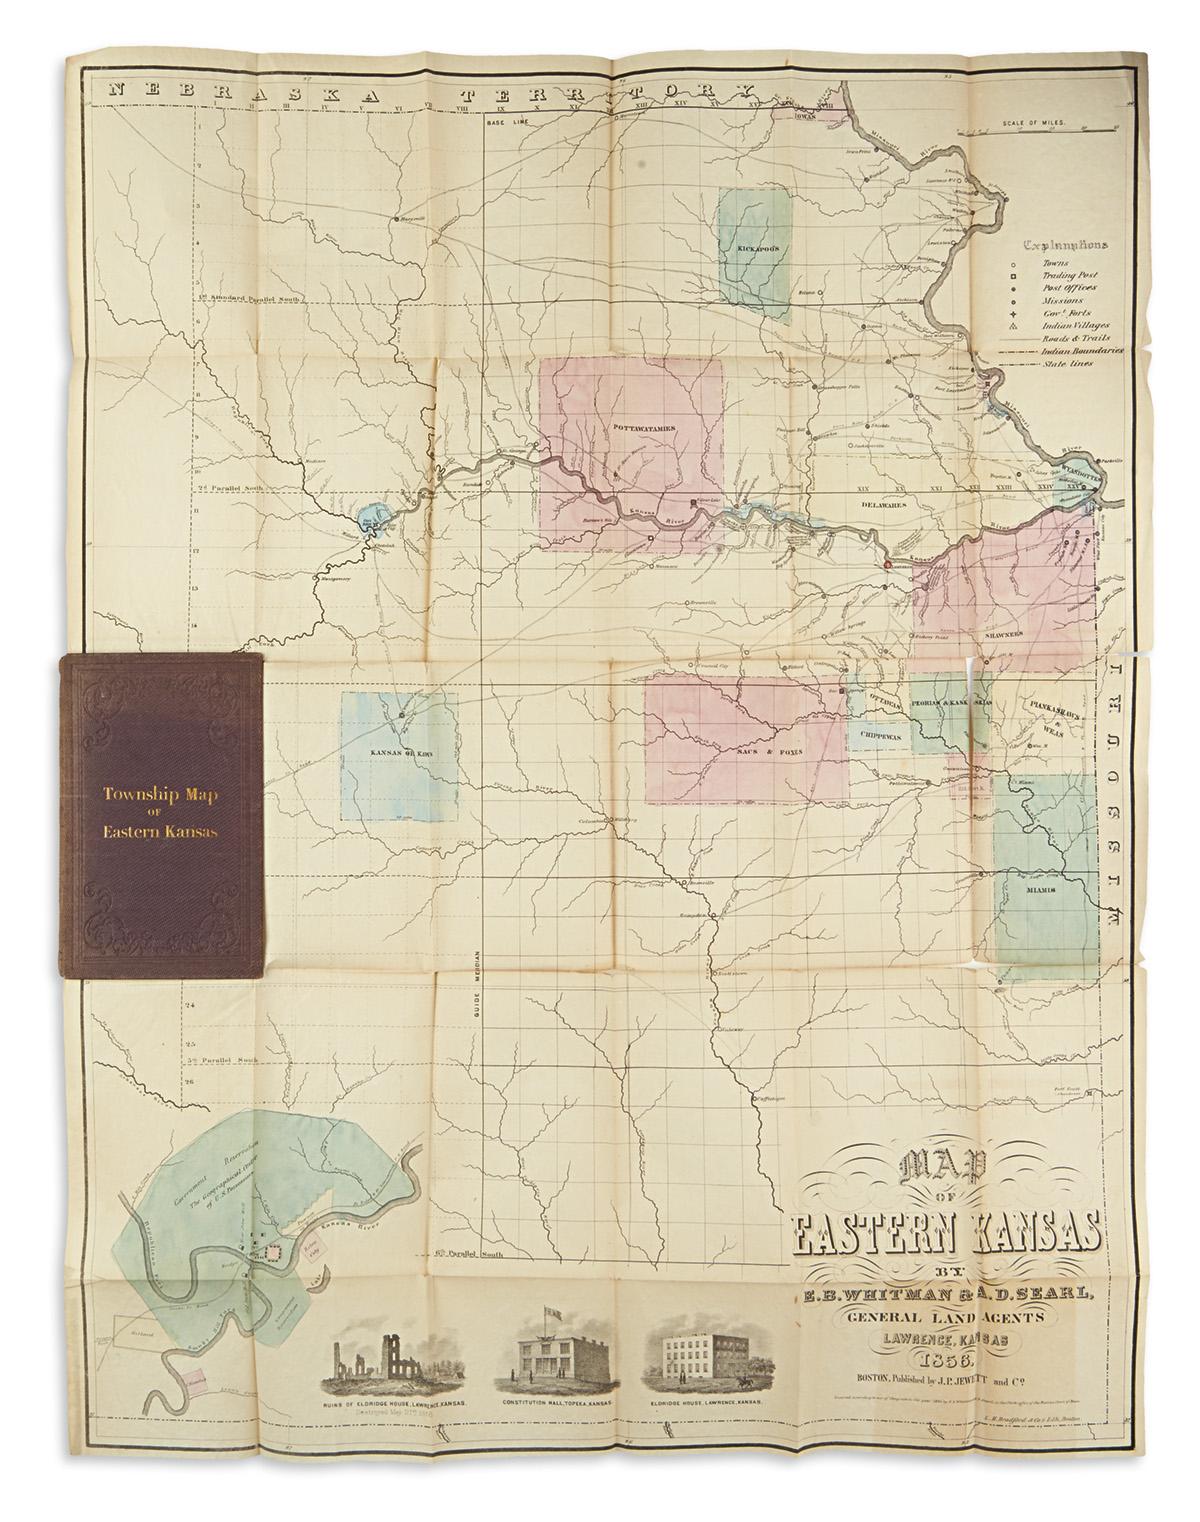 (KANSAS)-WHITMAN-EB;-AND-SEARL-AD-Map-of-Eastern-Kansas